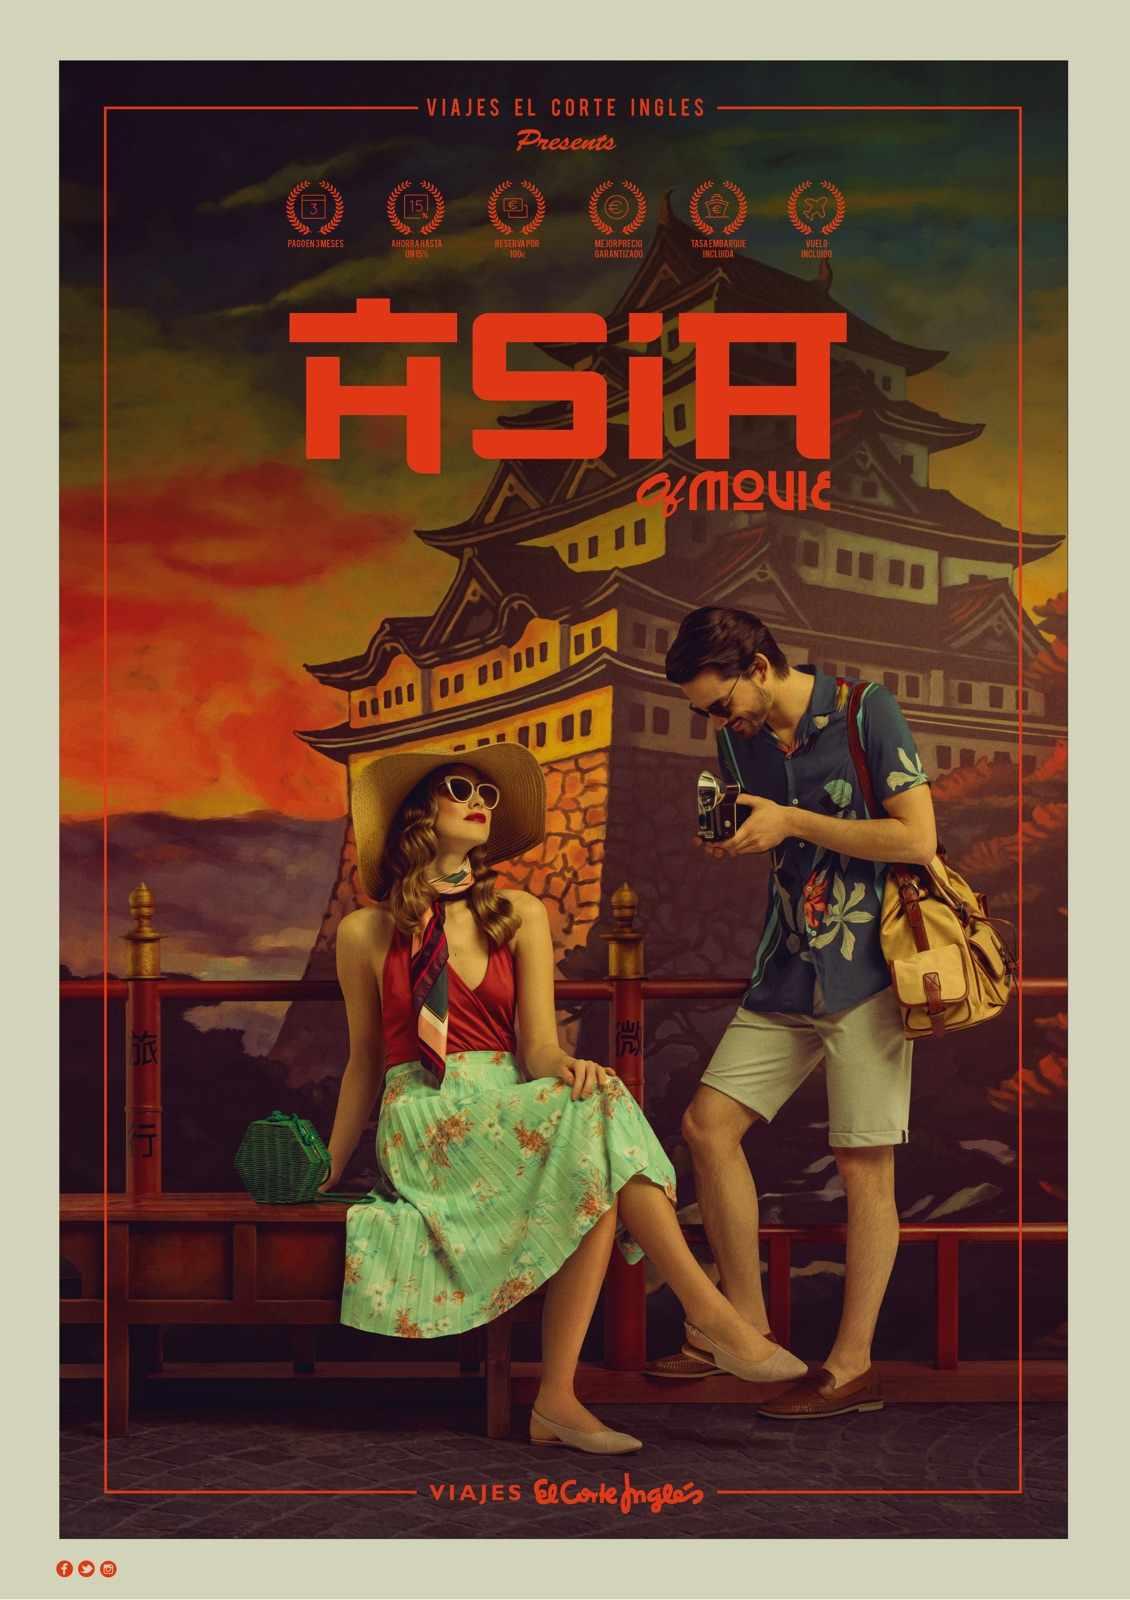 Viajes el Corte Ingles Print Ad - Asia of Movie